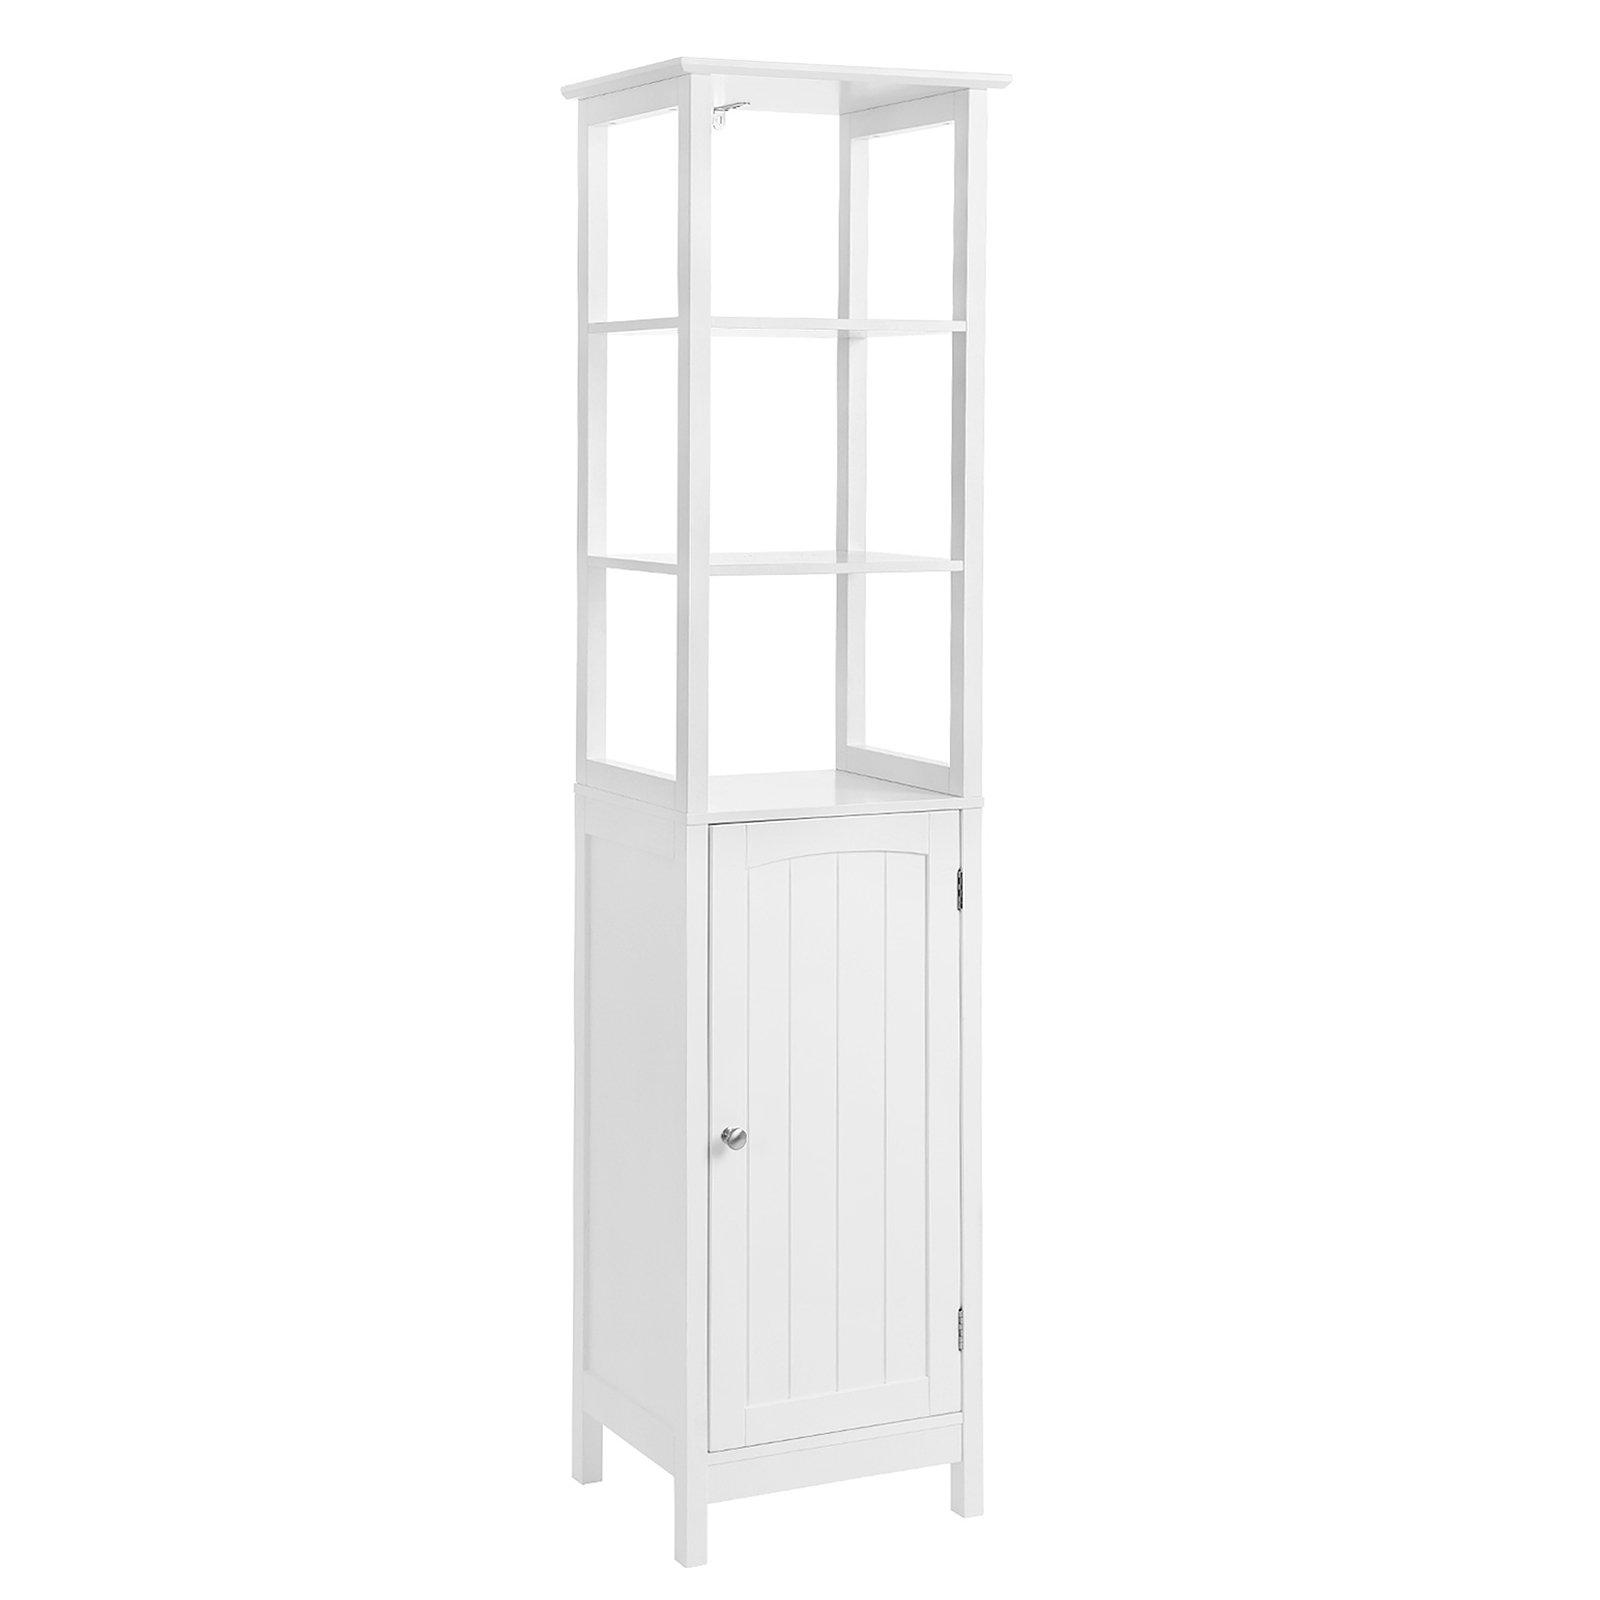 SONGMICS Floor Cabinet, Multifunctional Bathroom Storage Cabinet with 3 Tier Shelf, Free Standing Linen Tower, Wooden, White, UBBC63WT